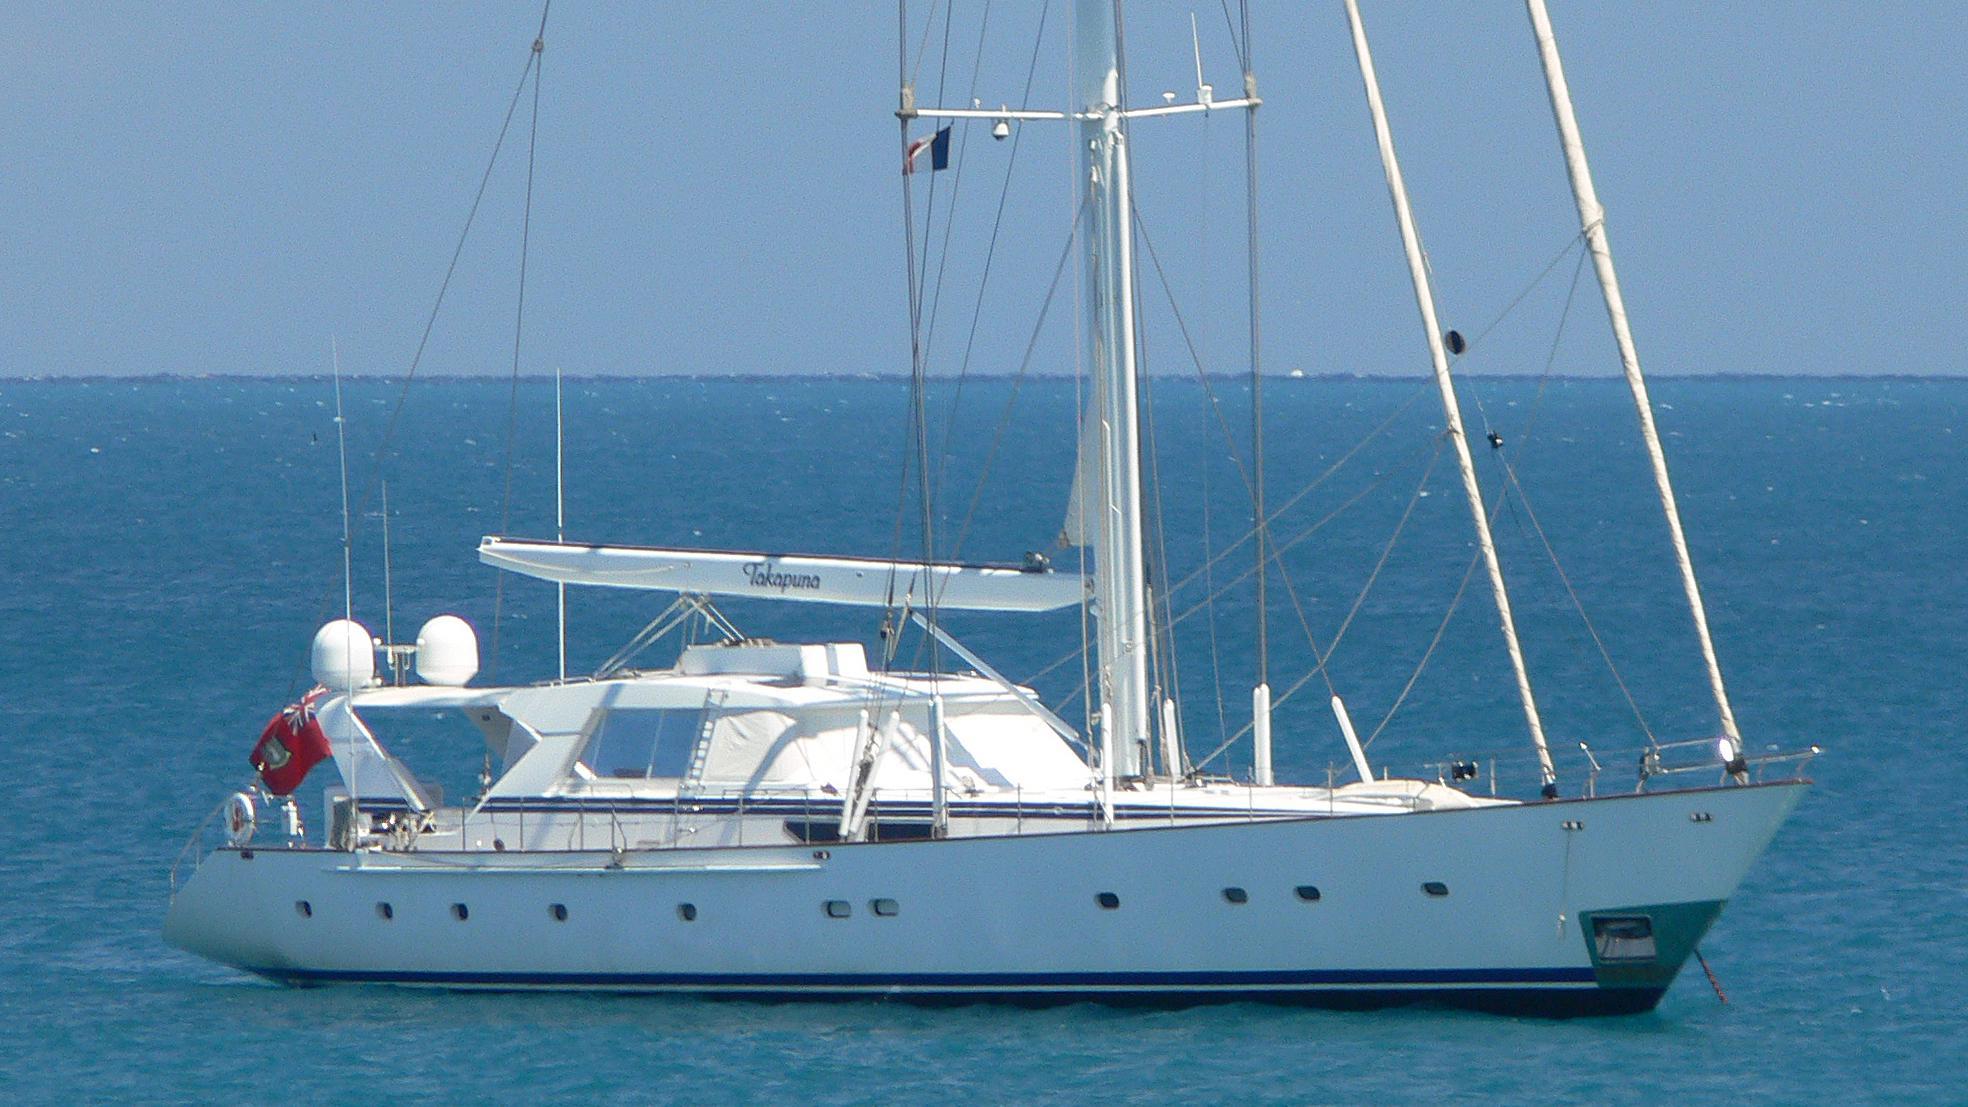 takapuna-sailing-yacht-valdettaro-112-1994-34m-profile